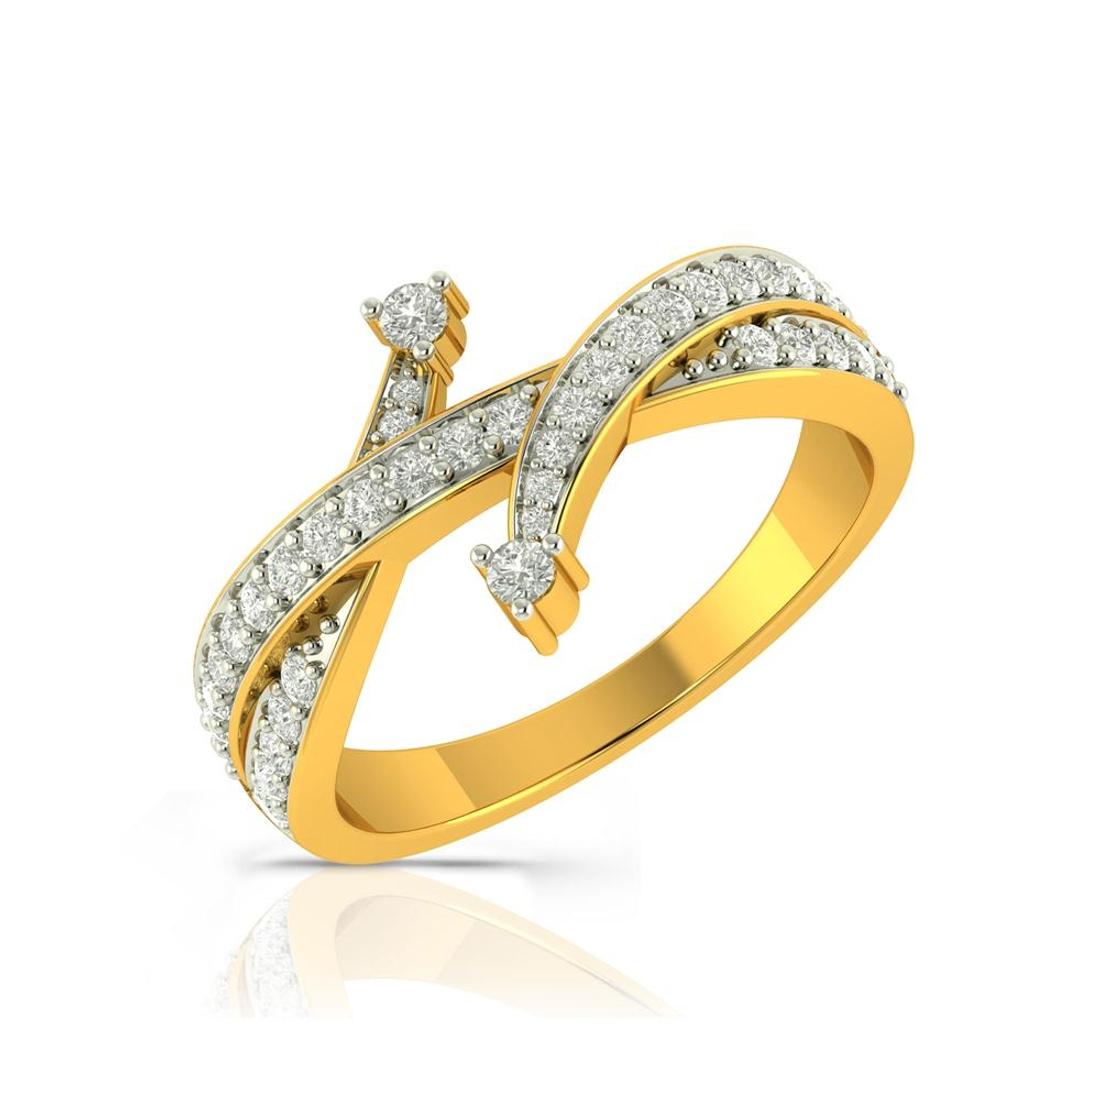 Buy Charu Jewels Diamond Ladies Ring CJLR0323 Online in India